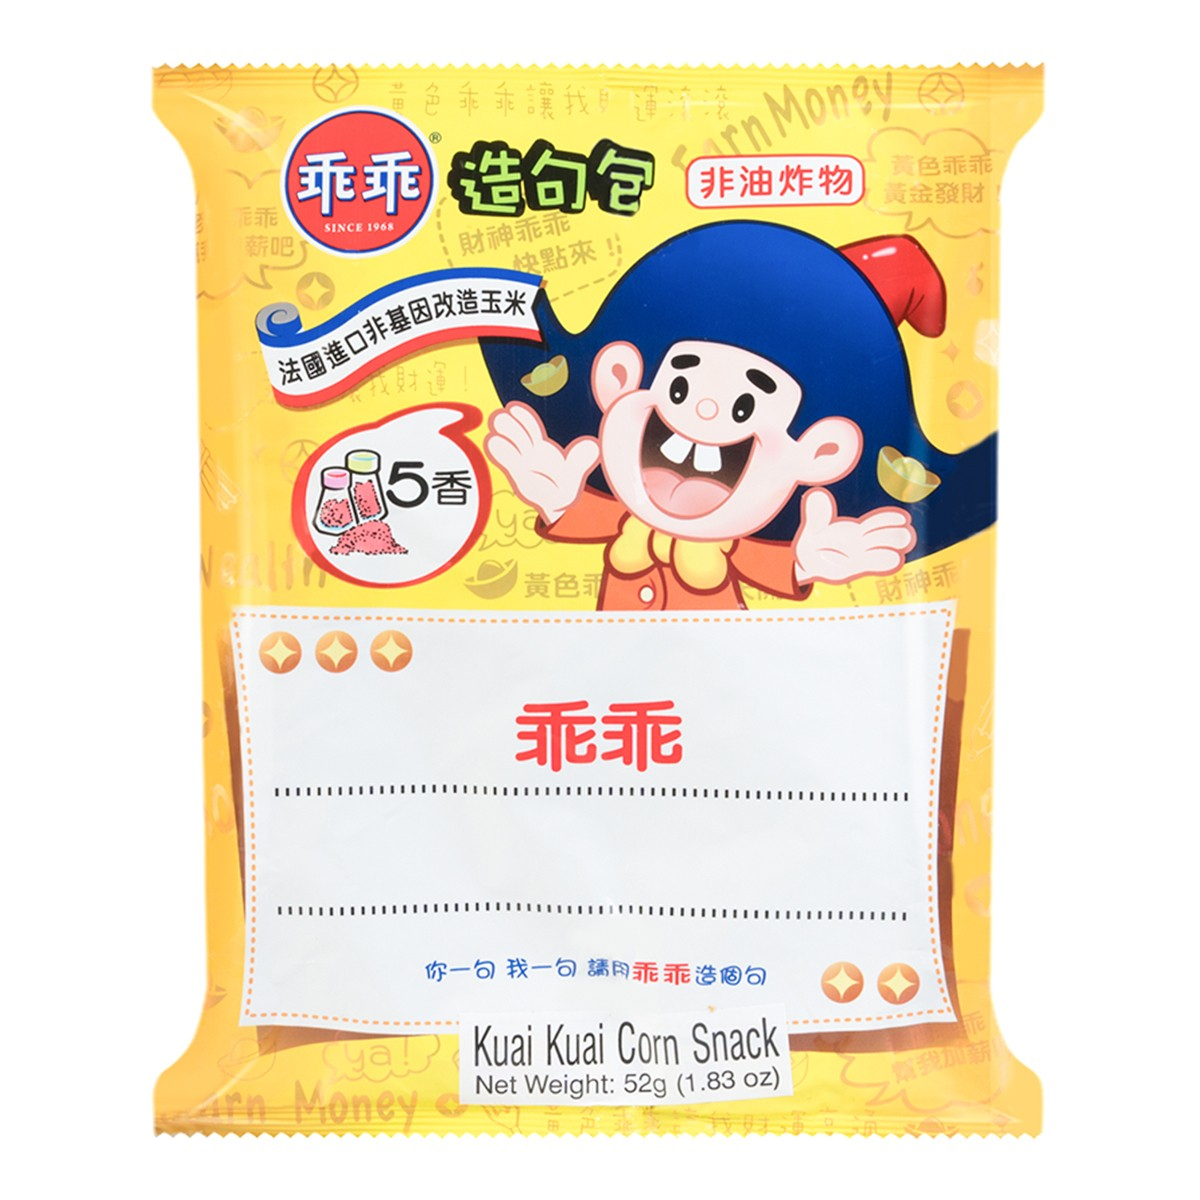 GUAI GUAI Corn Cracker Spicy Flavor 52g